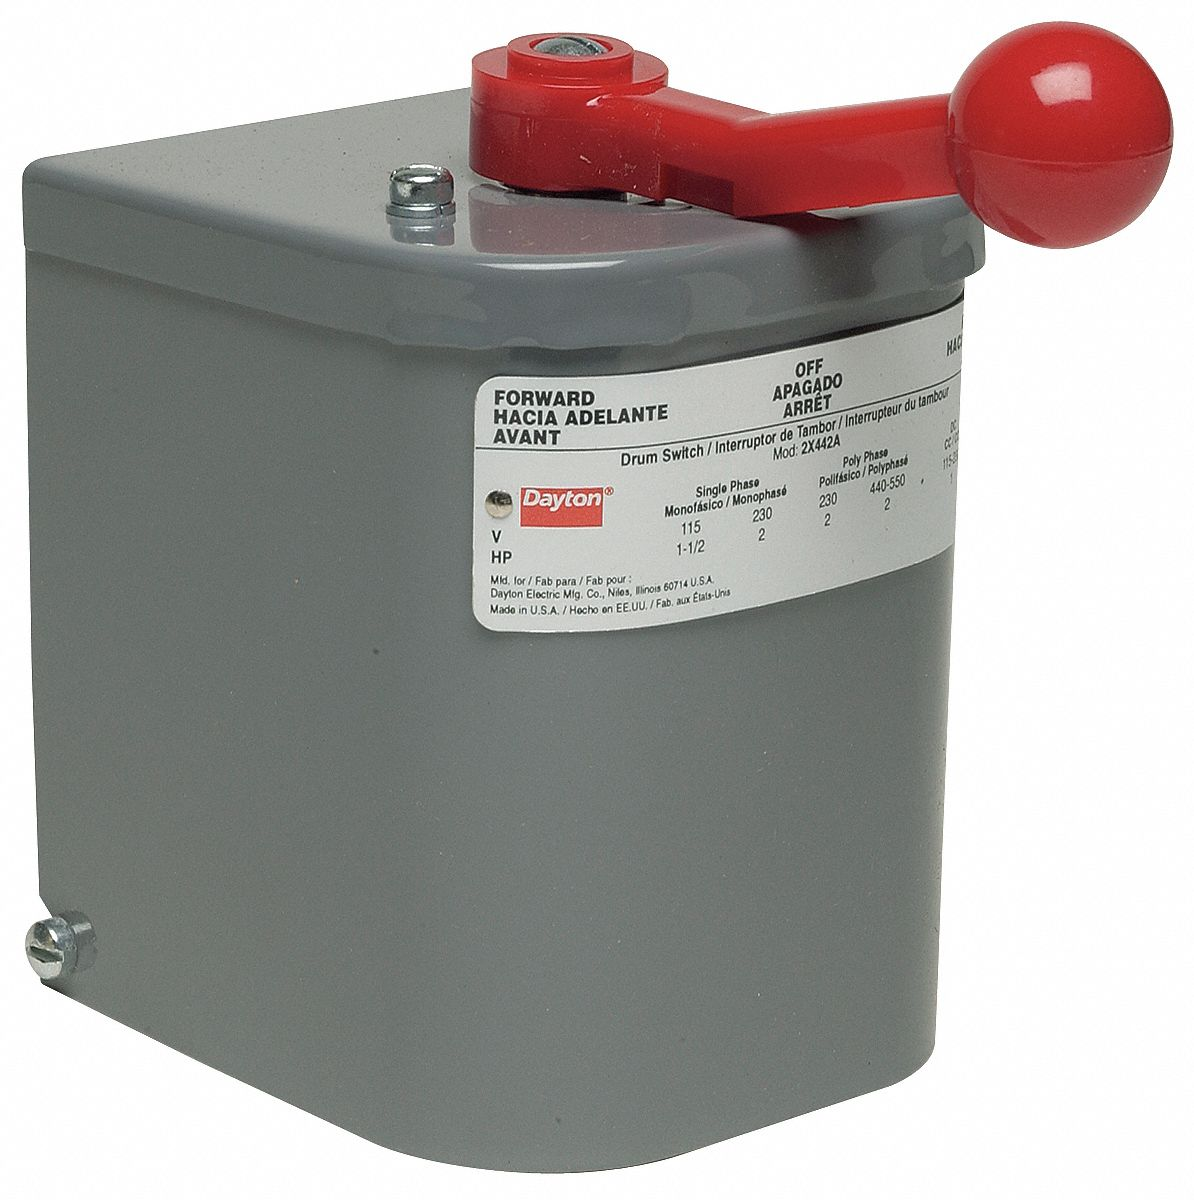 Dayton Maintained Reversing Plastic Drum Switch 3 Pole Nema Rating Wiring For Motor On Phase Forward Reverse 1 2x442 Grainger